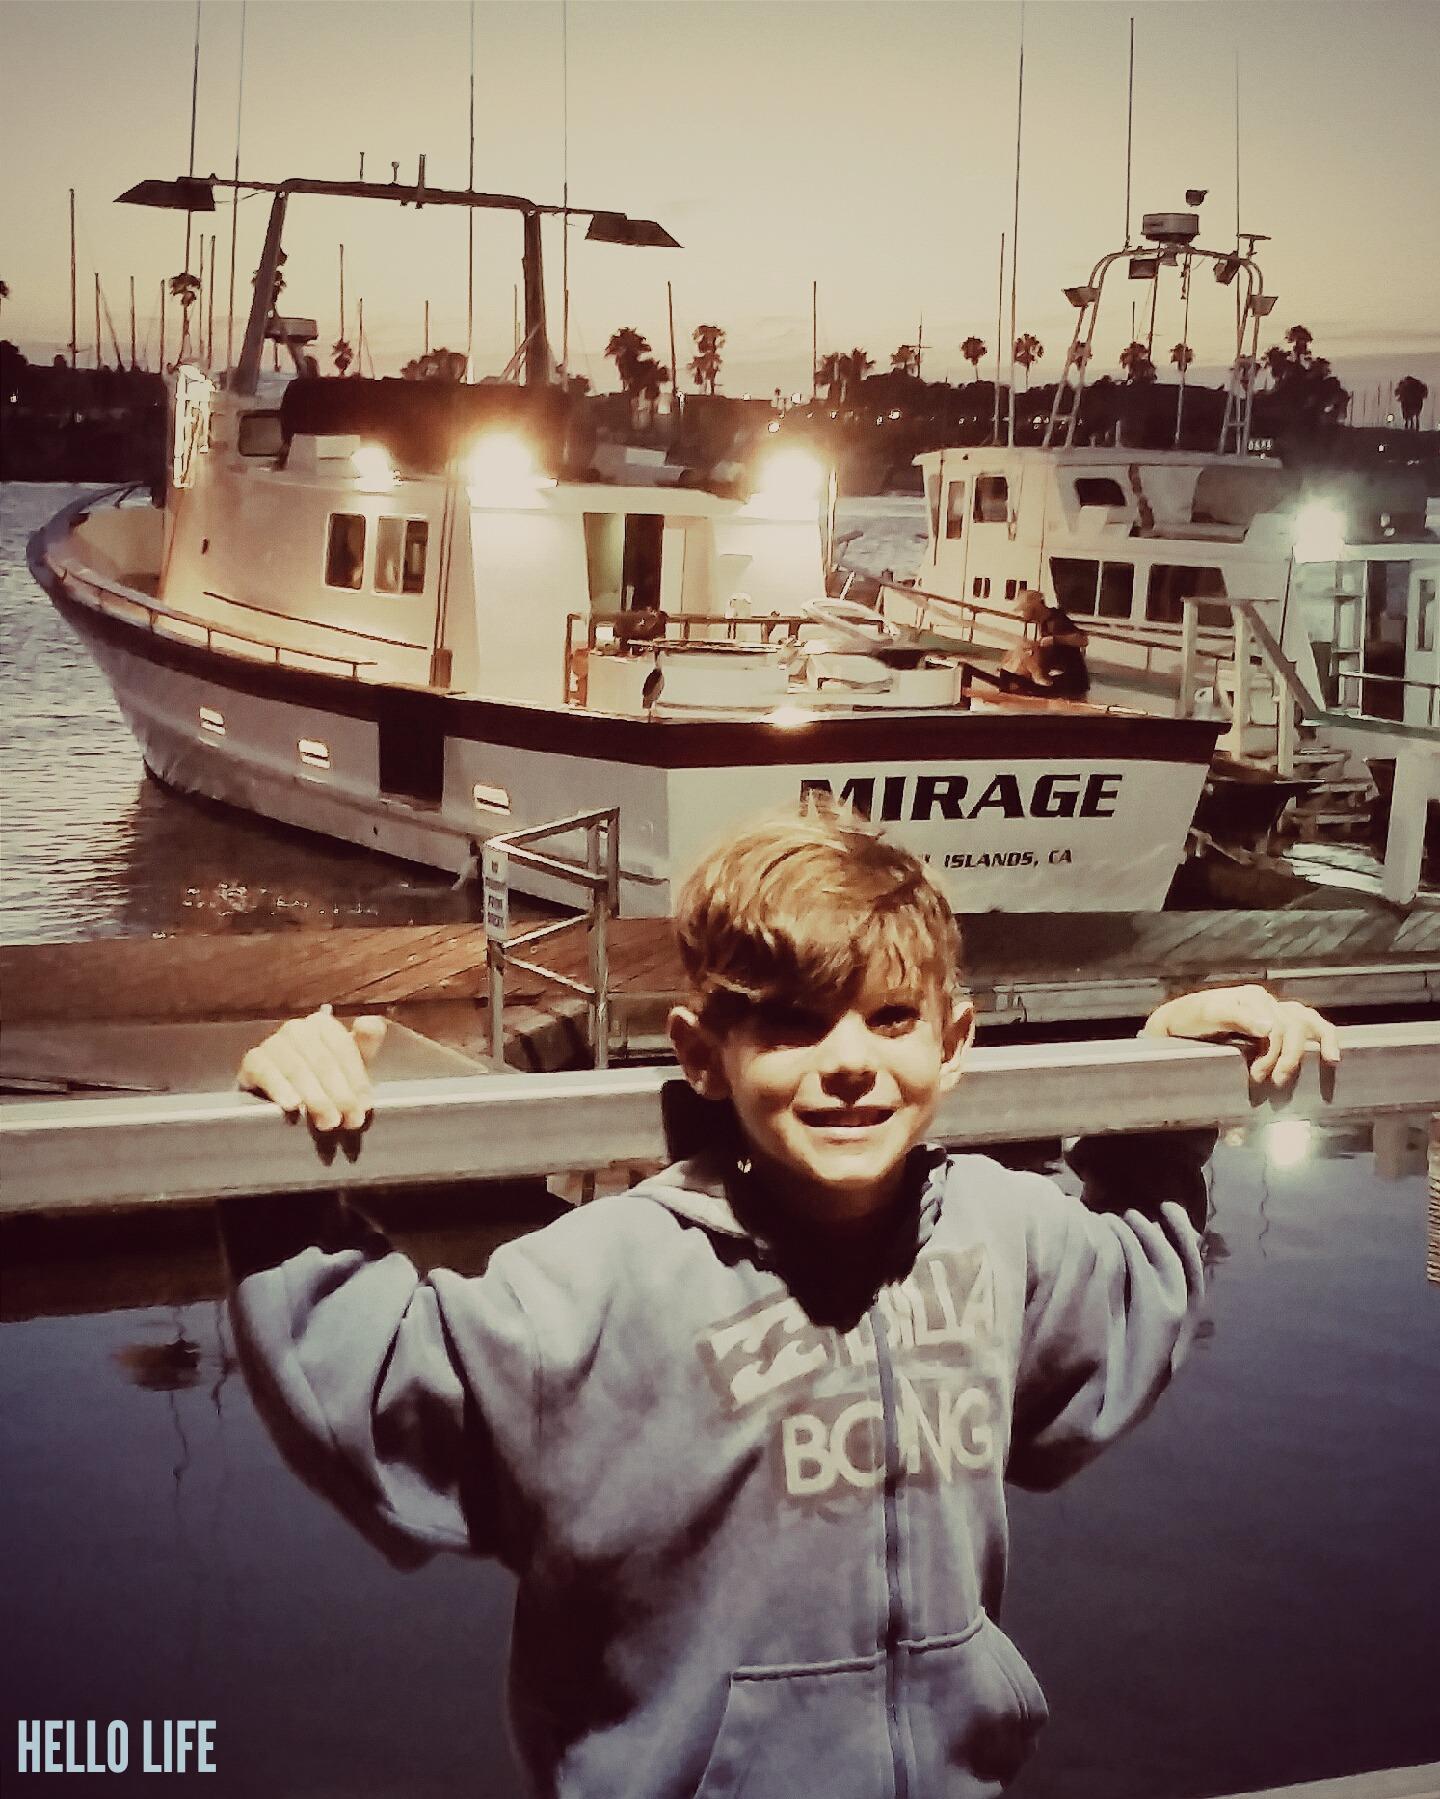 Boy on a boat dock via Hello Life hellolifeonline.com